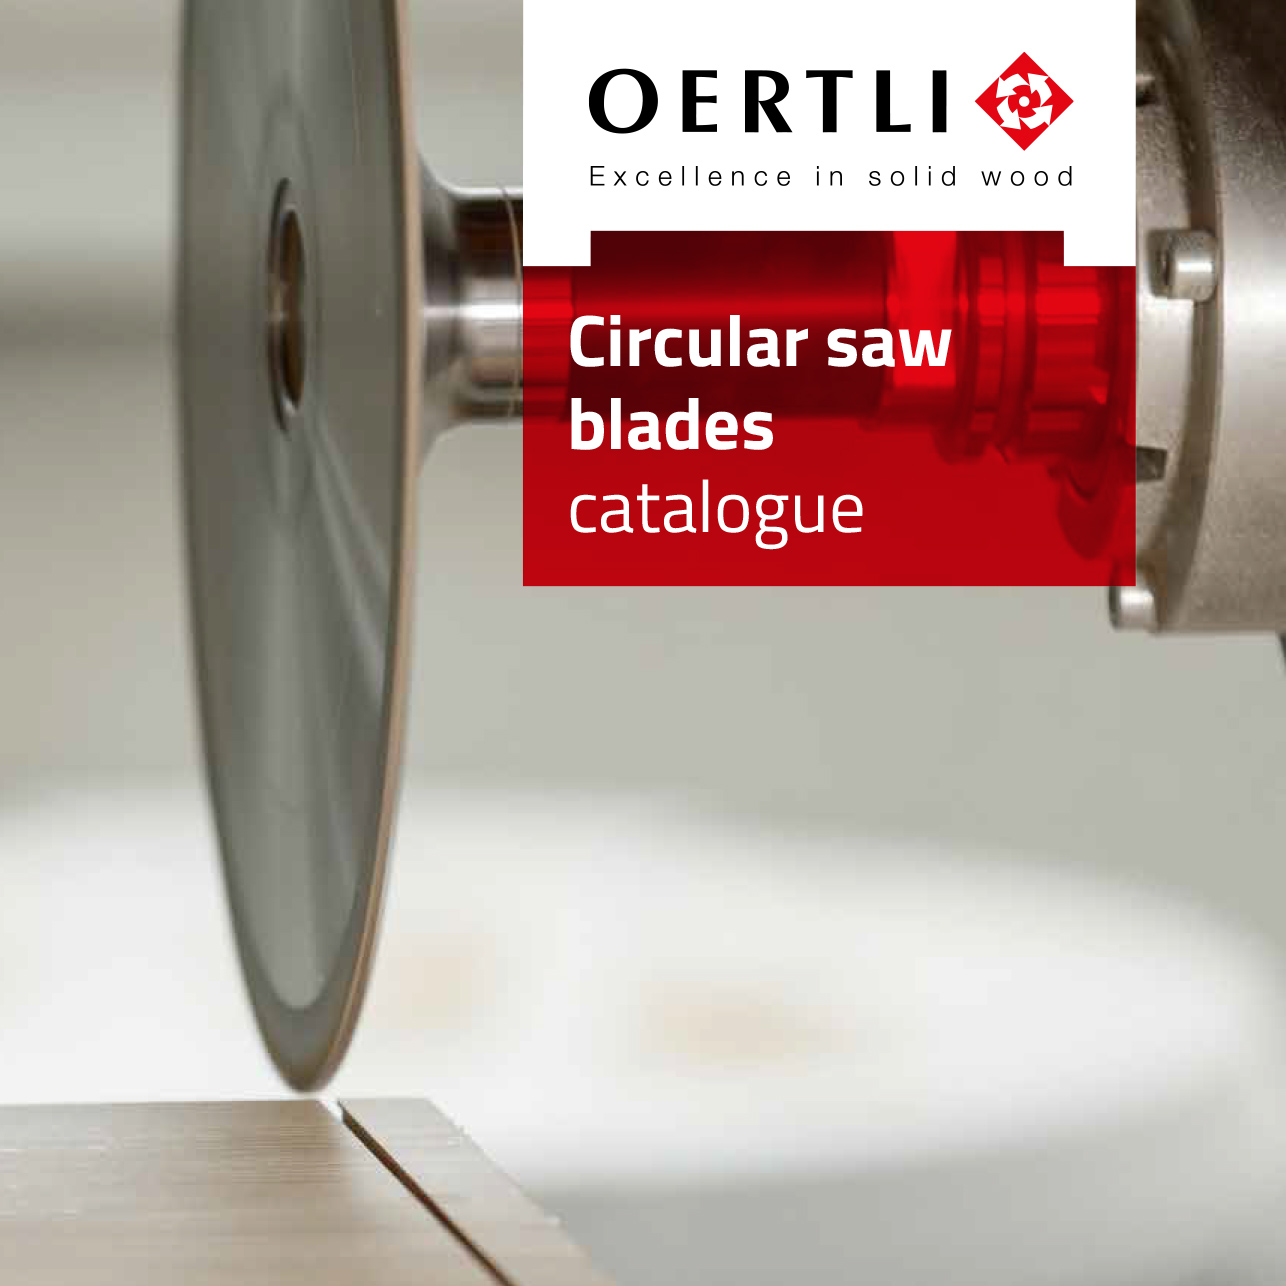 OERTLI circular saw blades